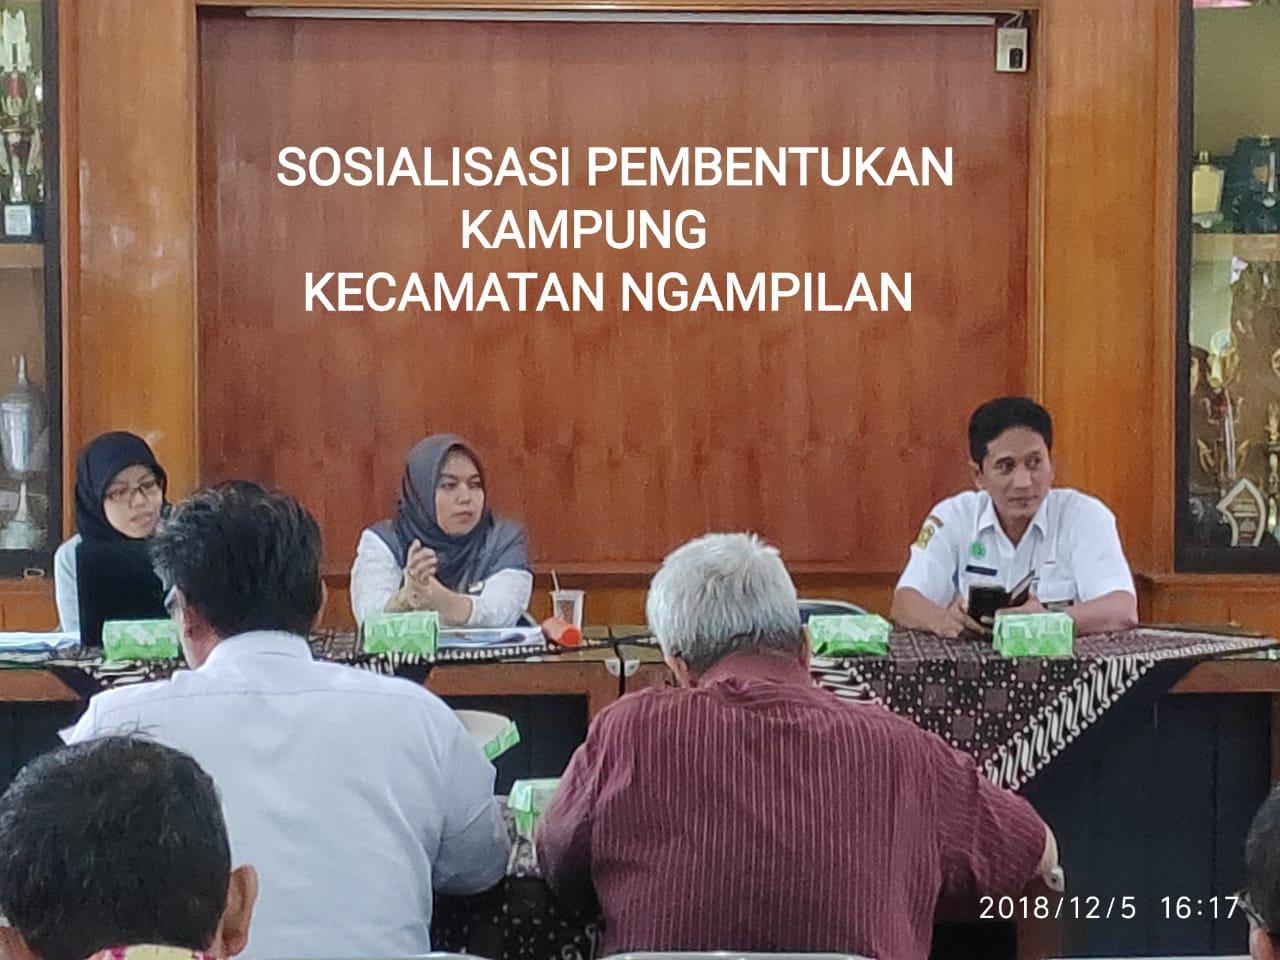 Sosialisai Pembentukan Kampung Kecamatan Ngampilan